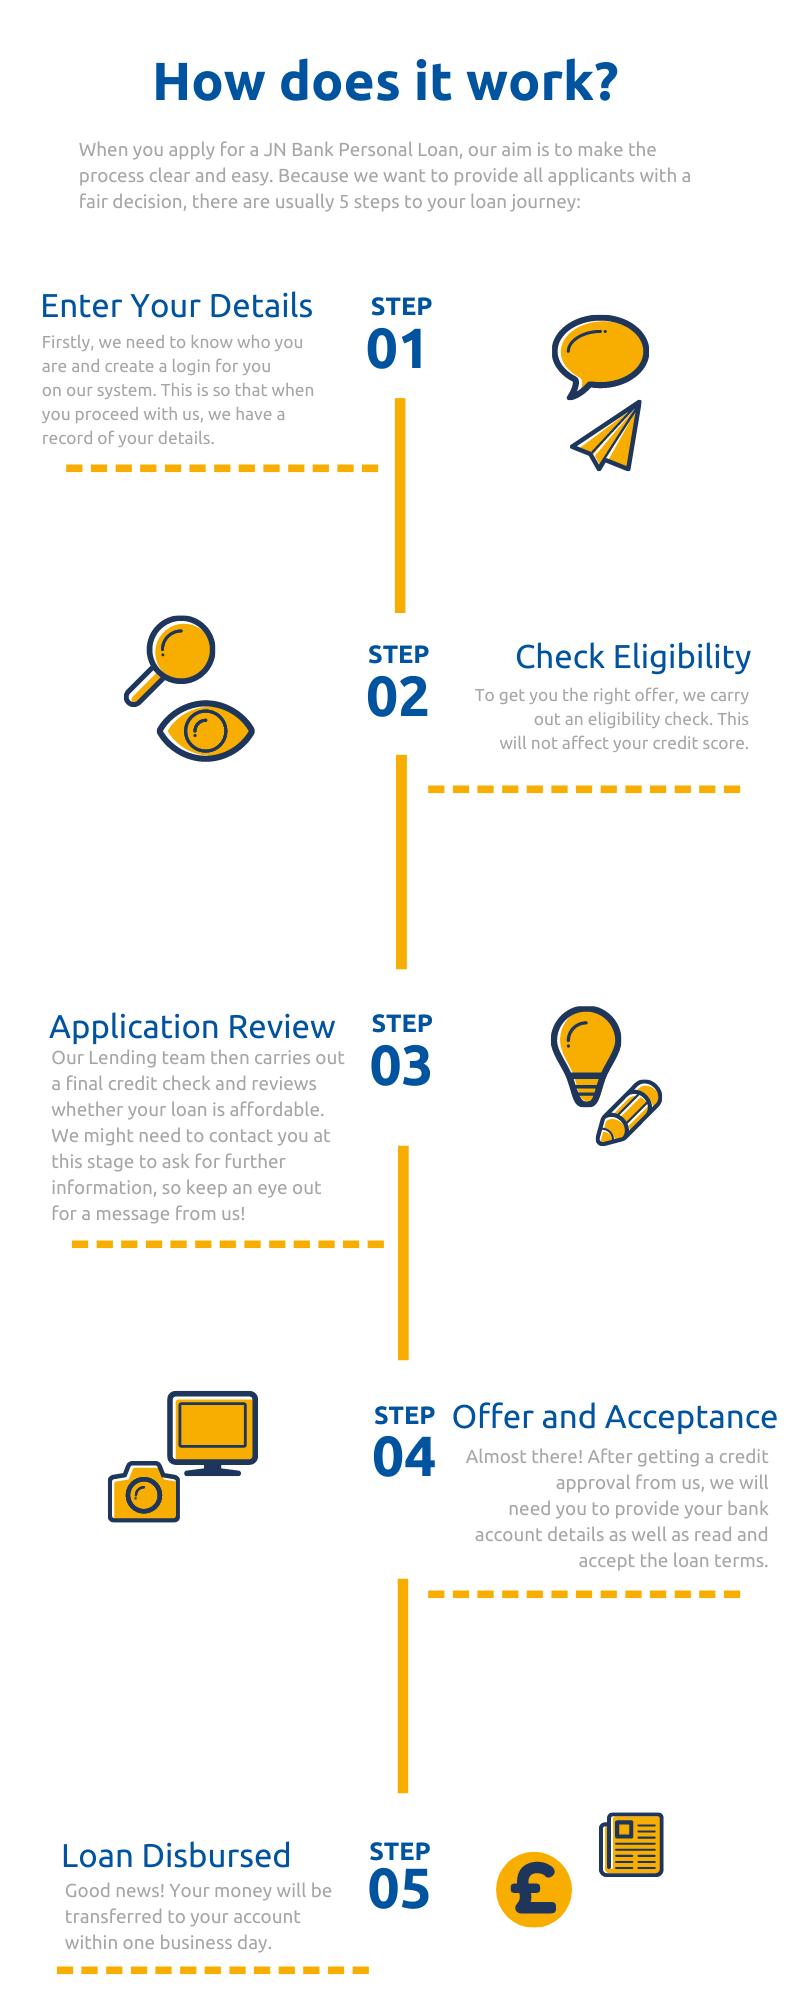 jn-bank-loan-process-how-to-3